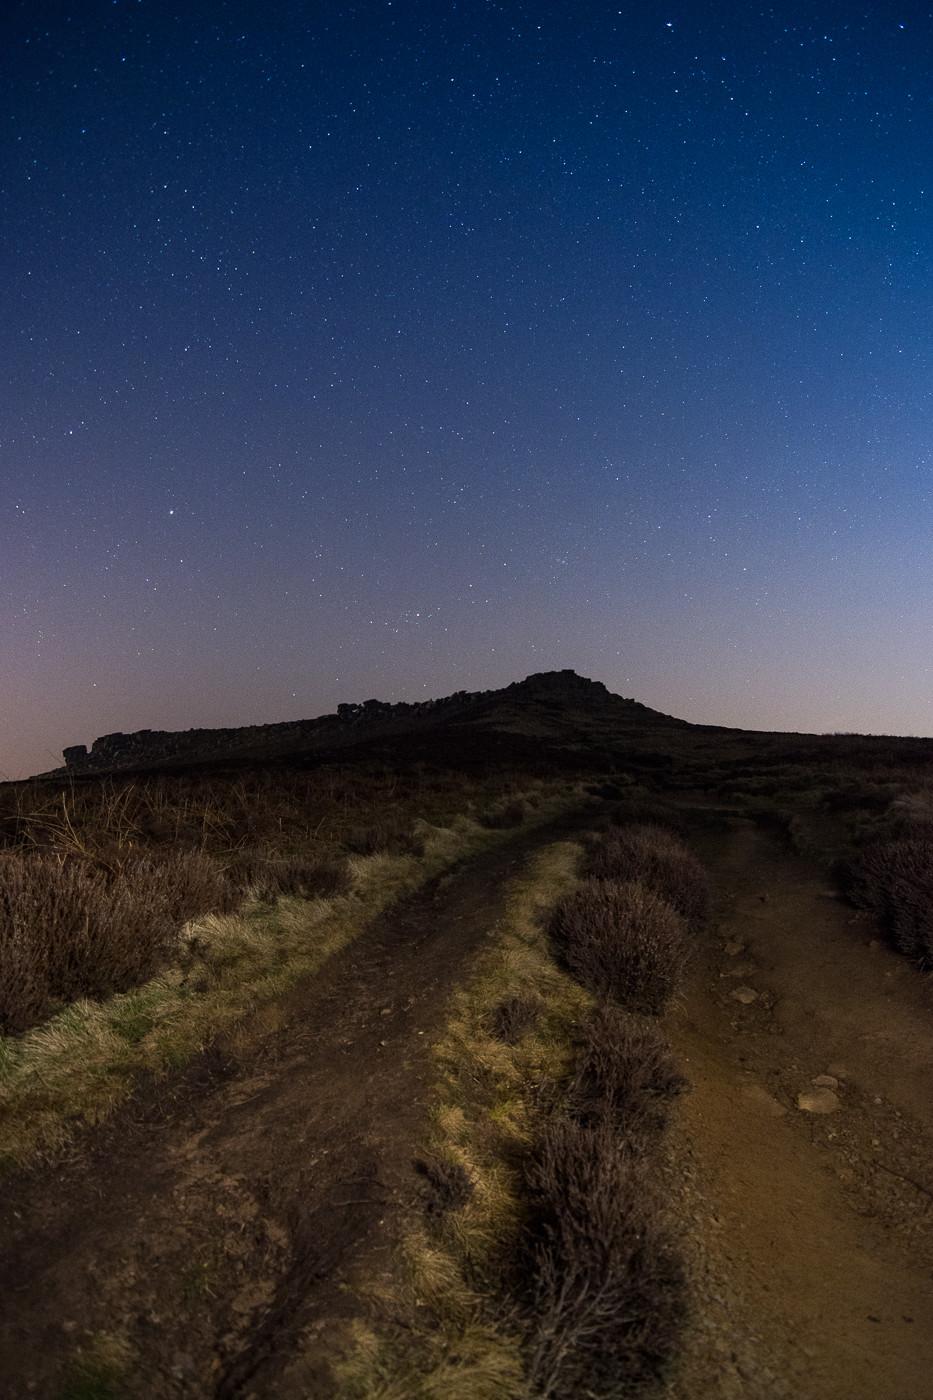 astro landscape, nightscape, astrophotography, carl wark, higger tor